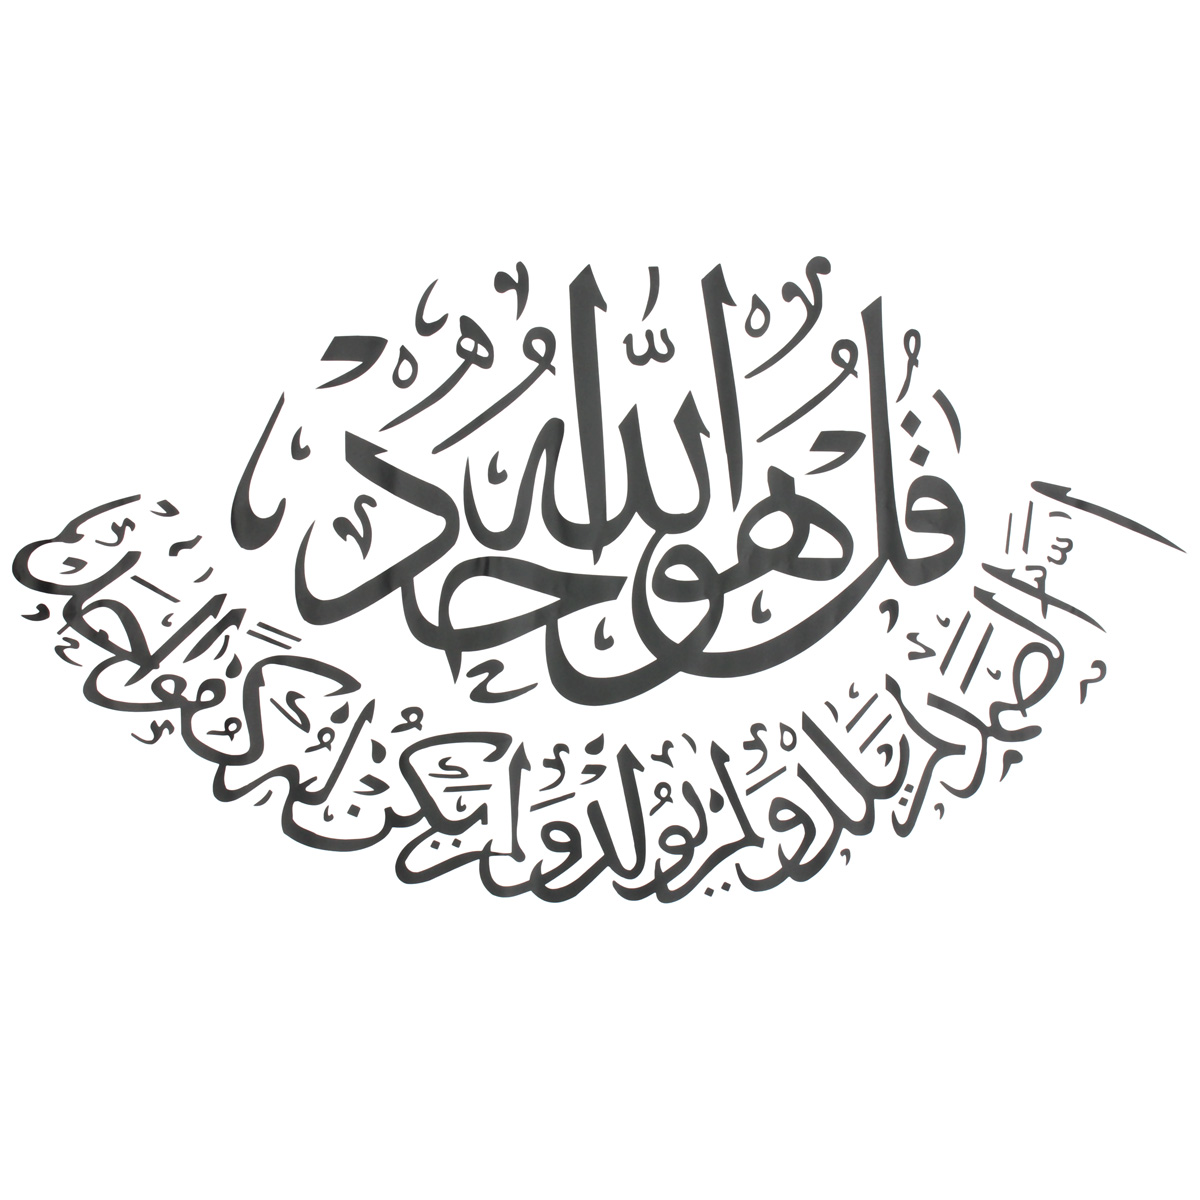 Islamic bismillah muslim wall sticker art arabic for Arabic calligraphy decoration